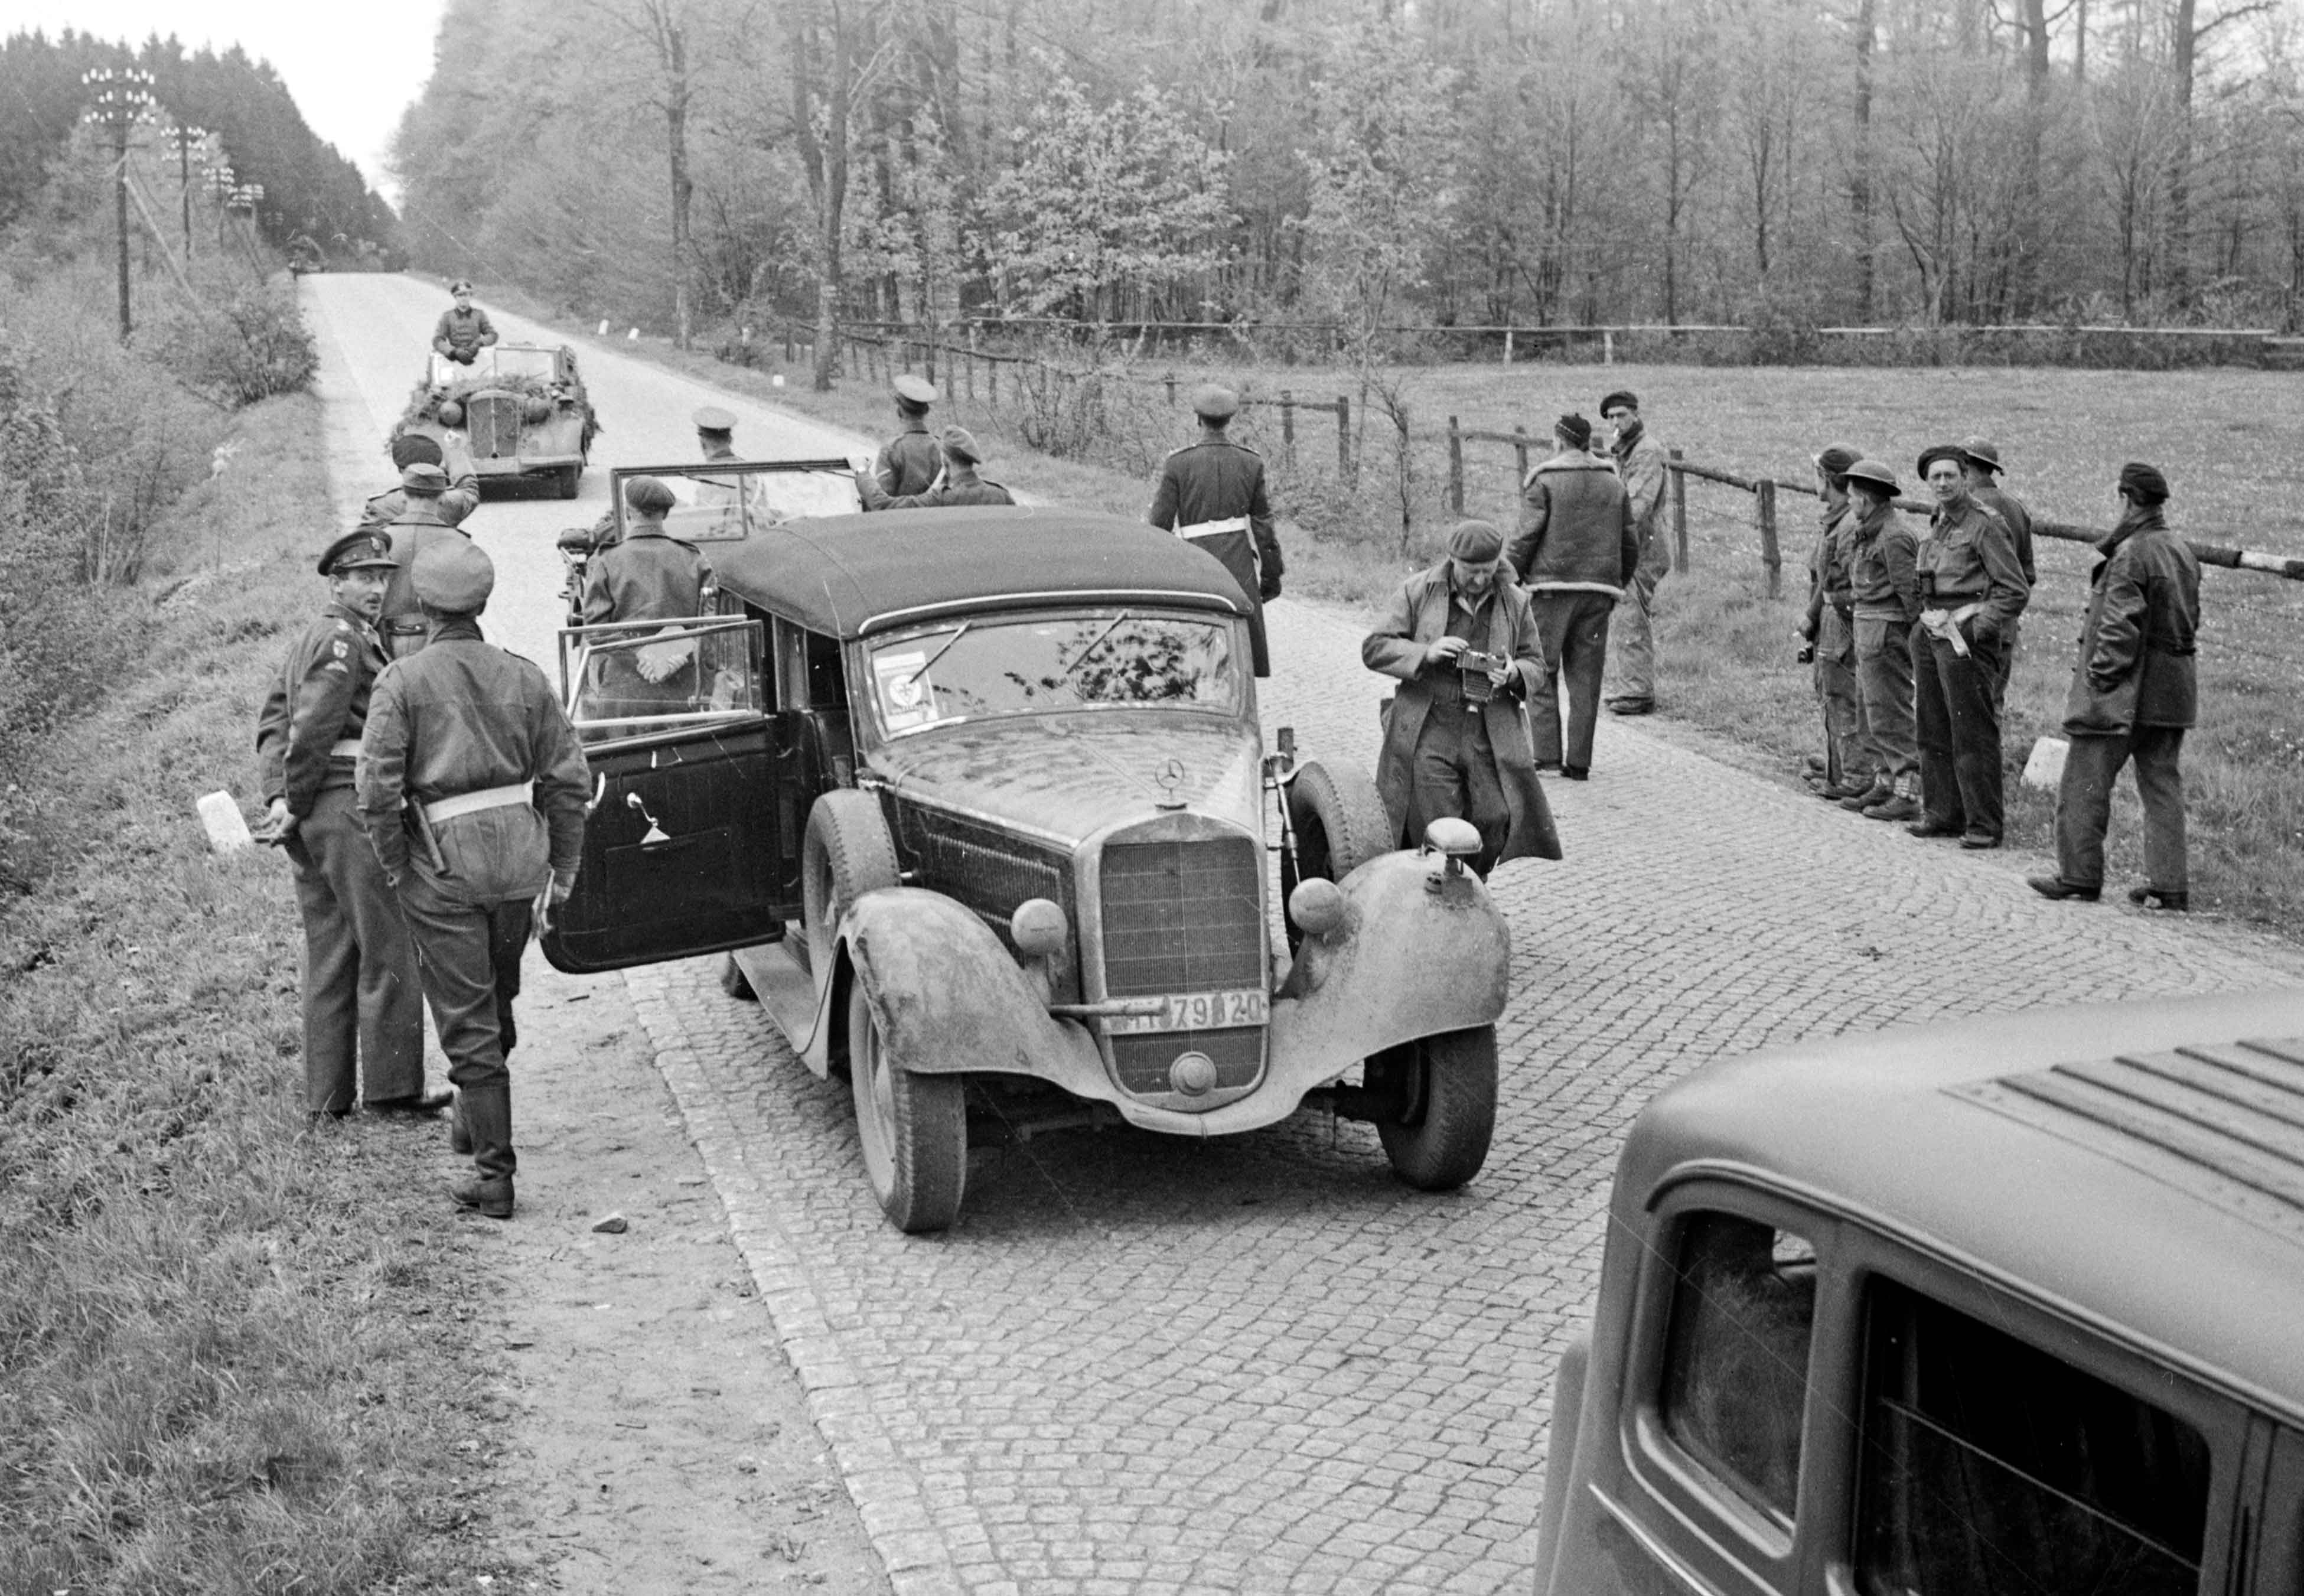 Interaktiv tidslinje: Följ Nazitysklands fall